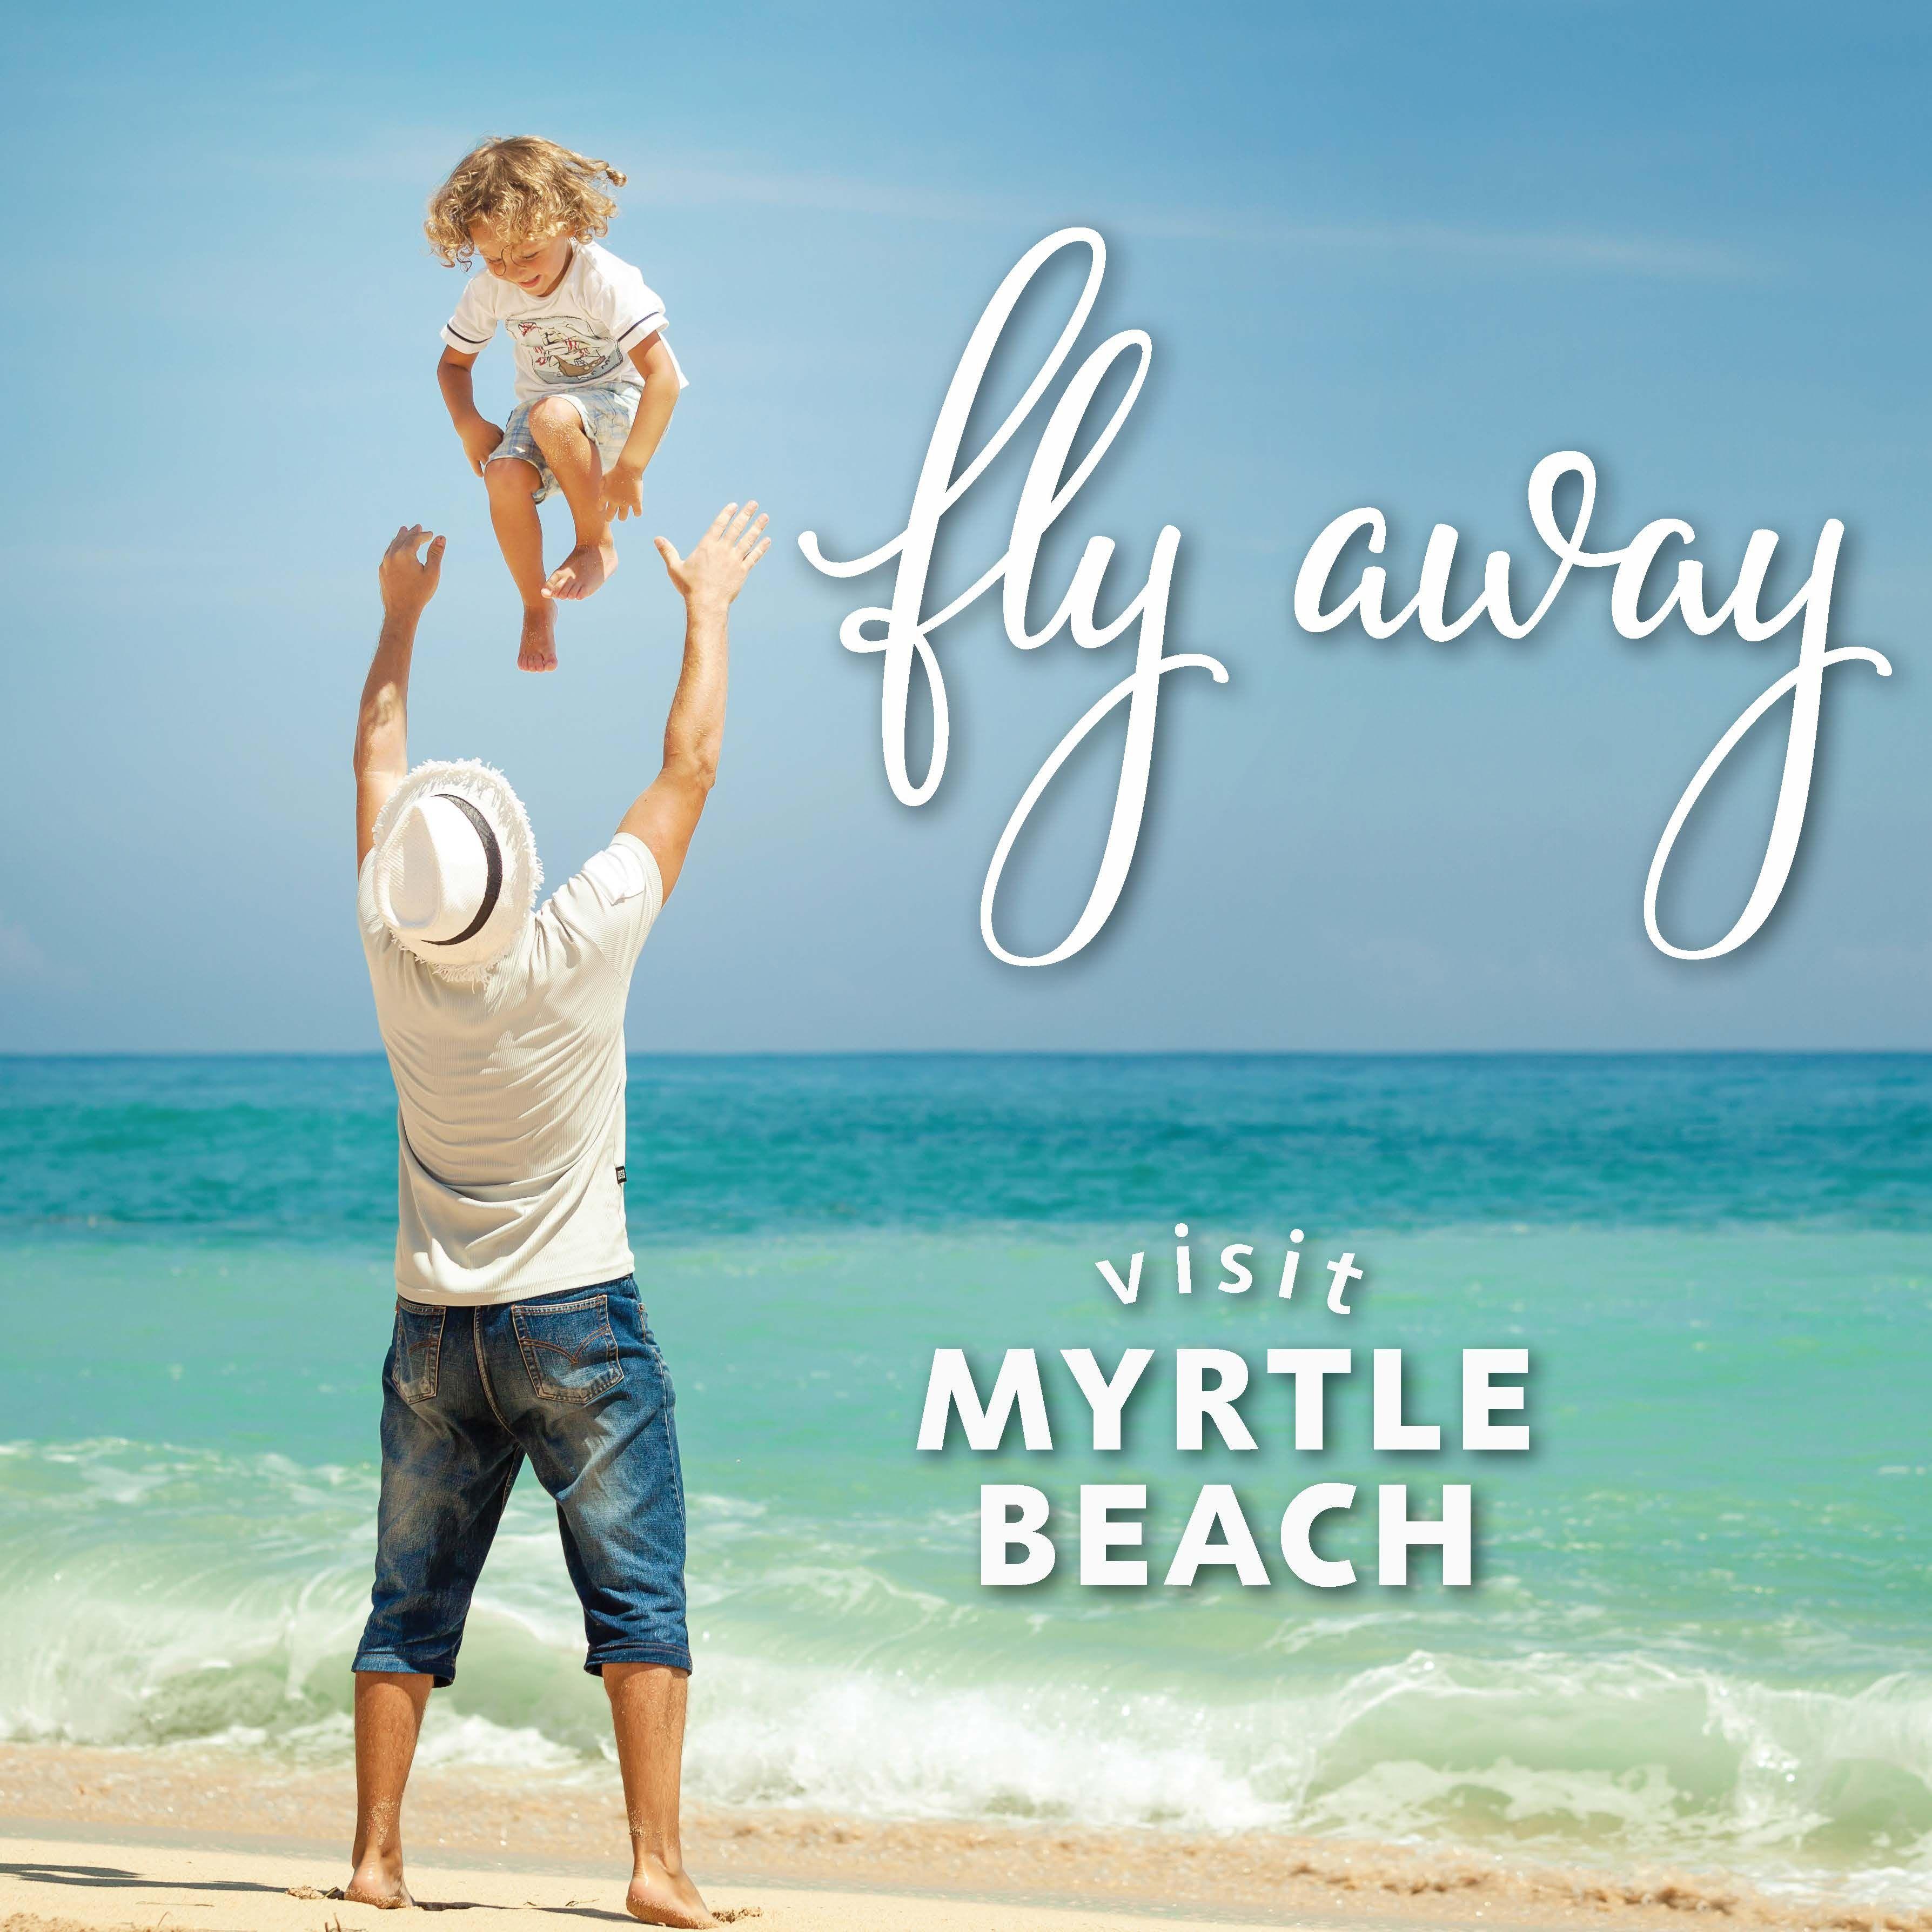 Myrtle Beach Sc Hotels Resorts Attractions Visit